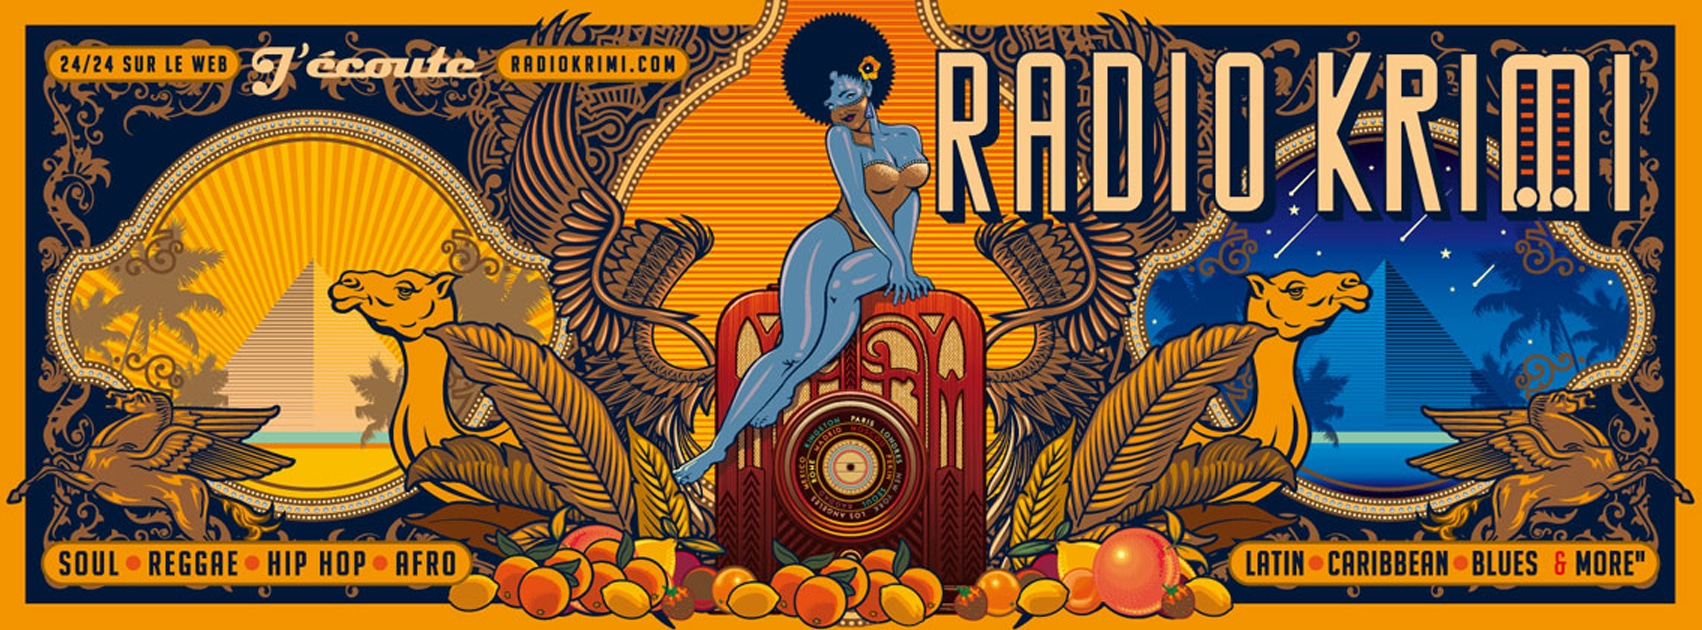 Radio Krimi - El Khat